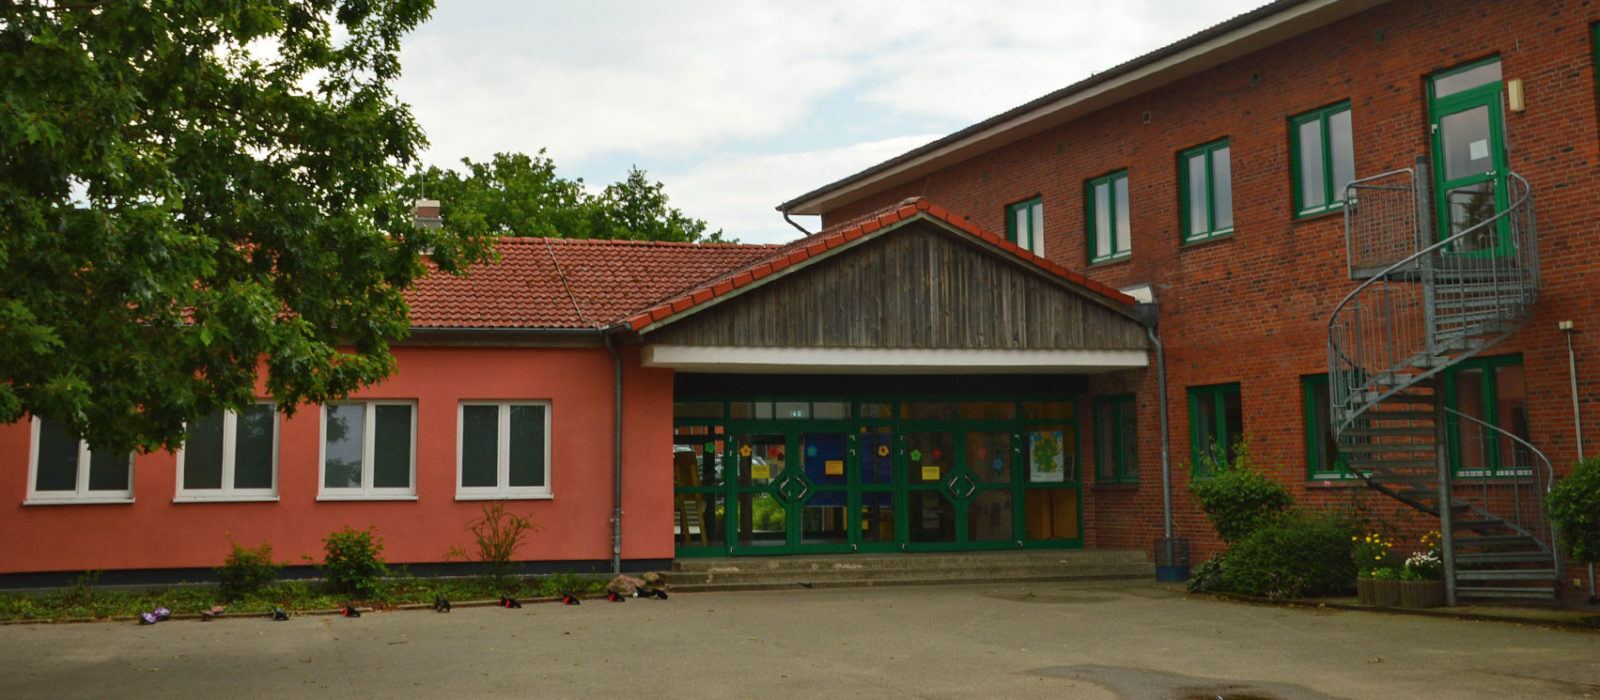 Grundschule Goldenbek